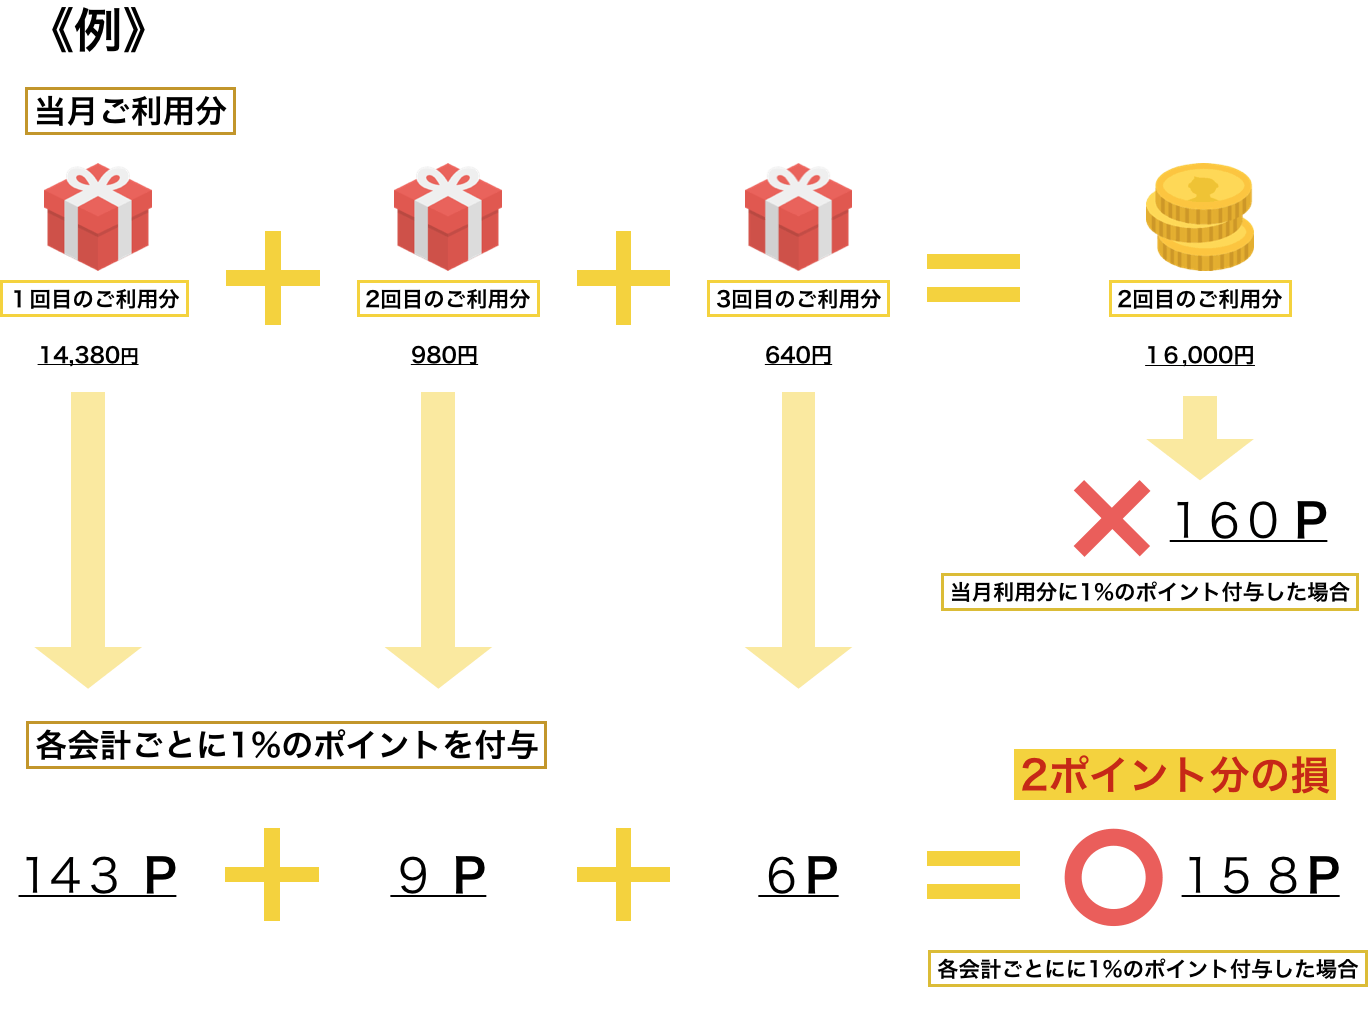 Yahoo! JAPANカードのポイントの付き方